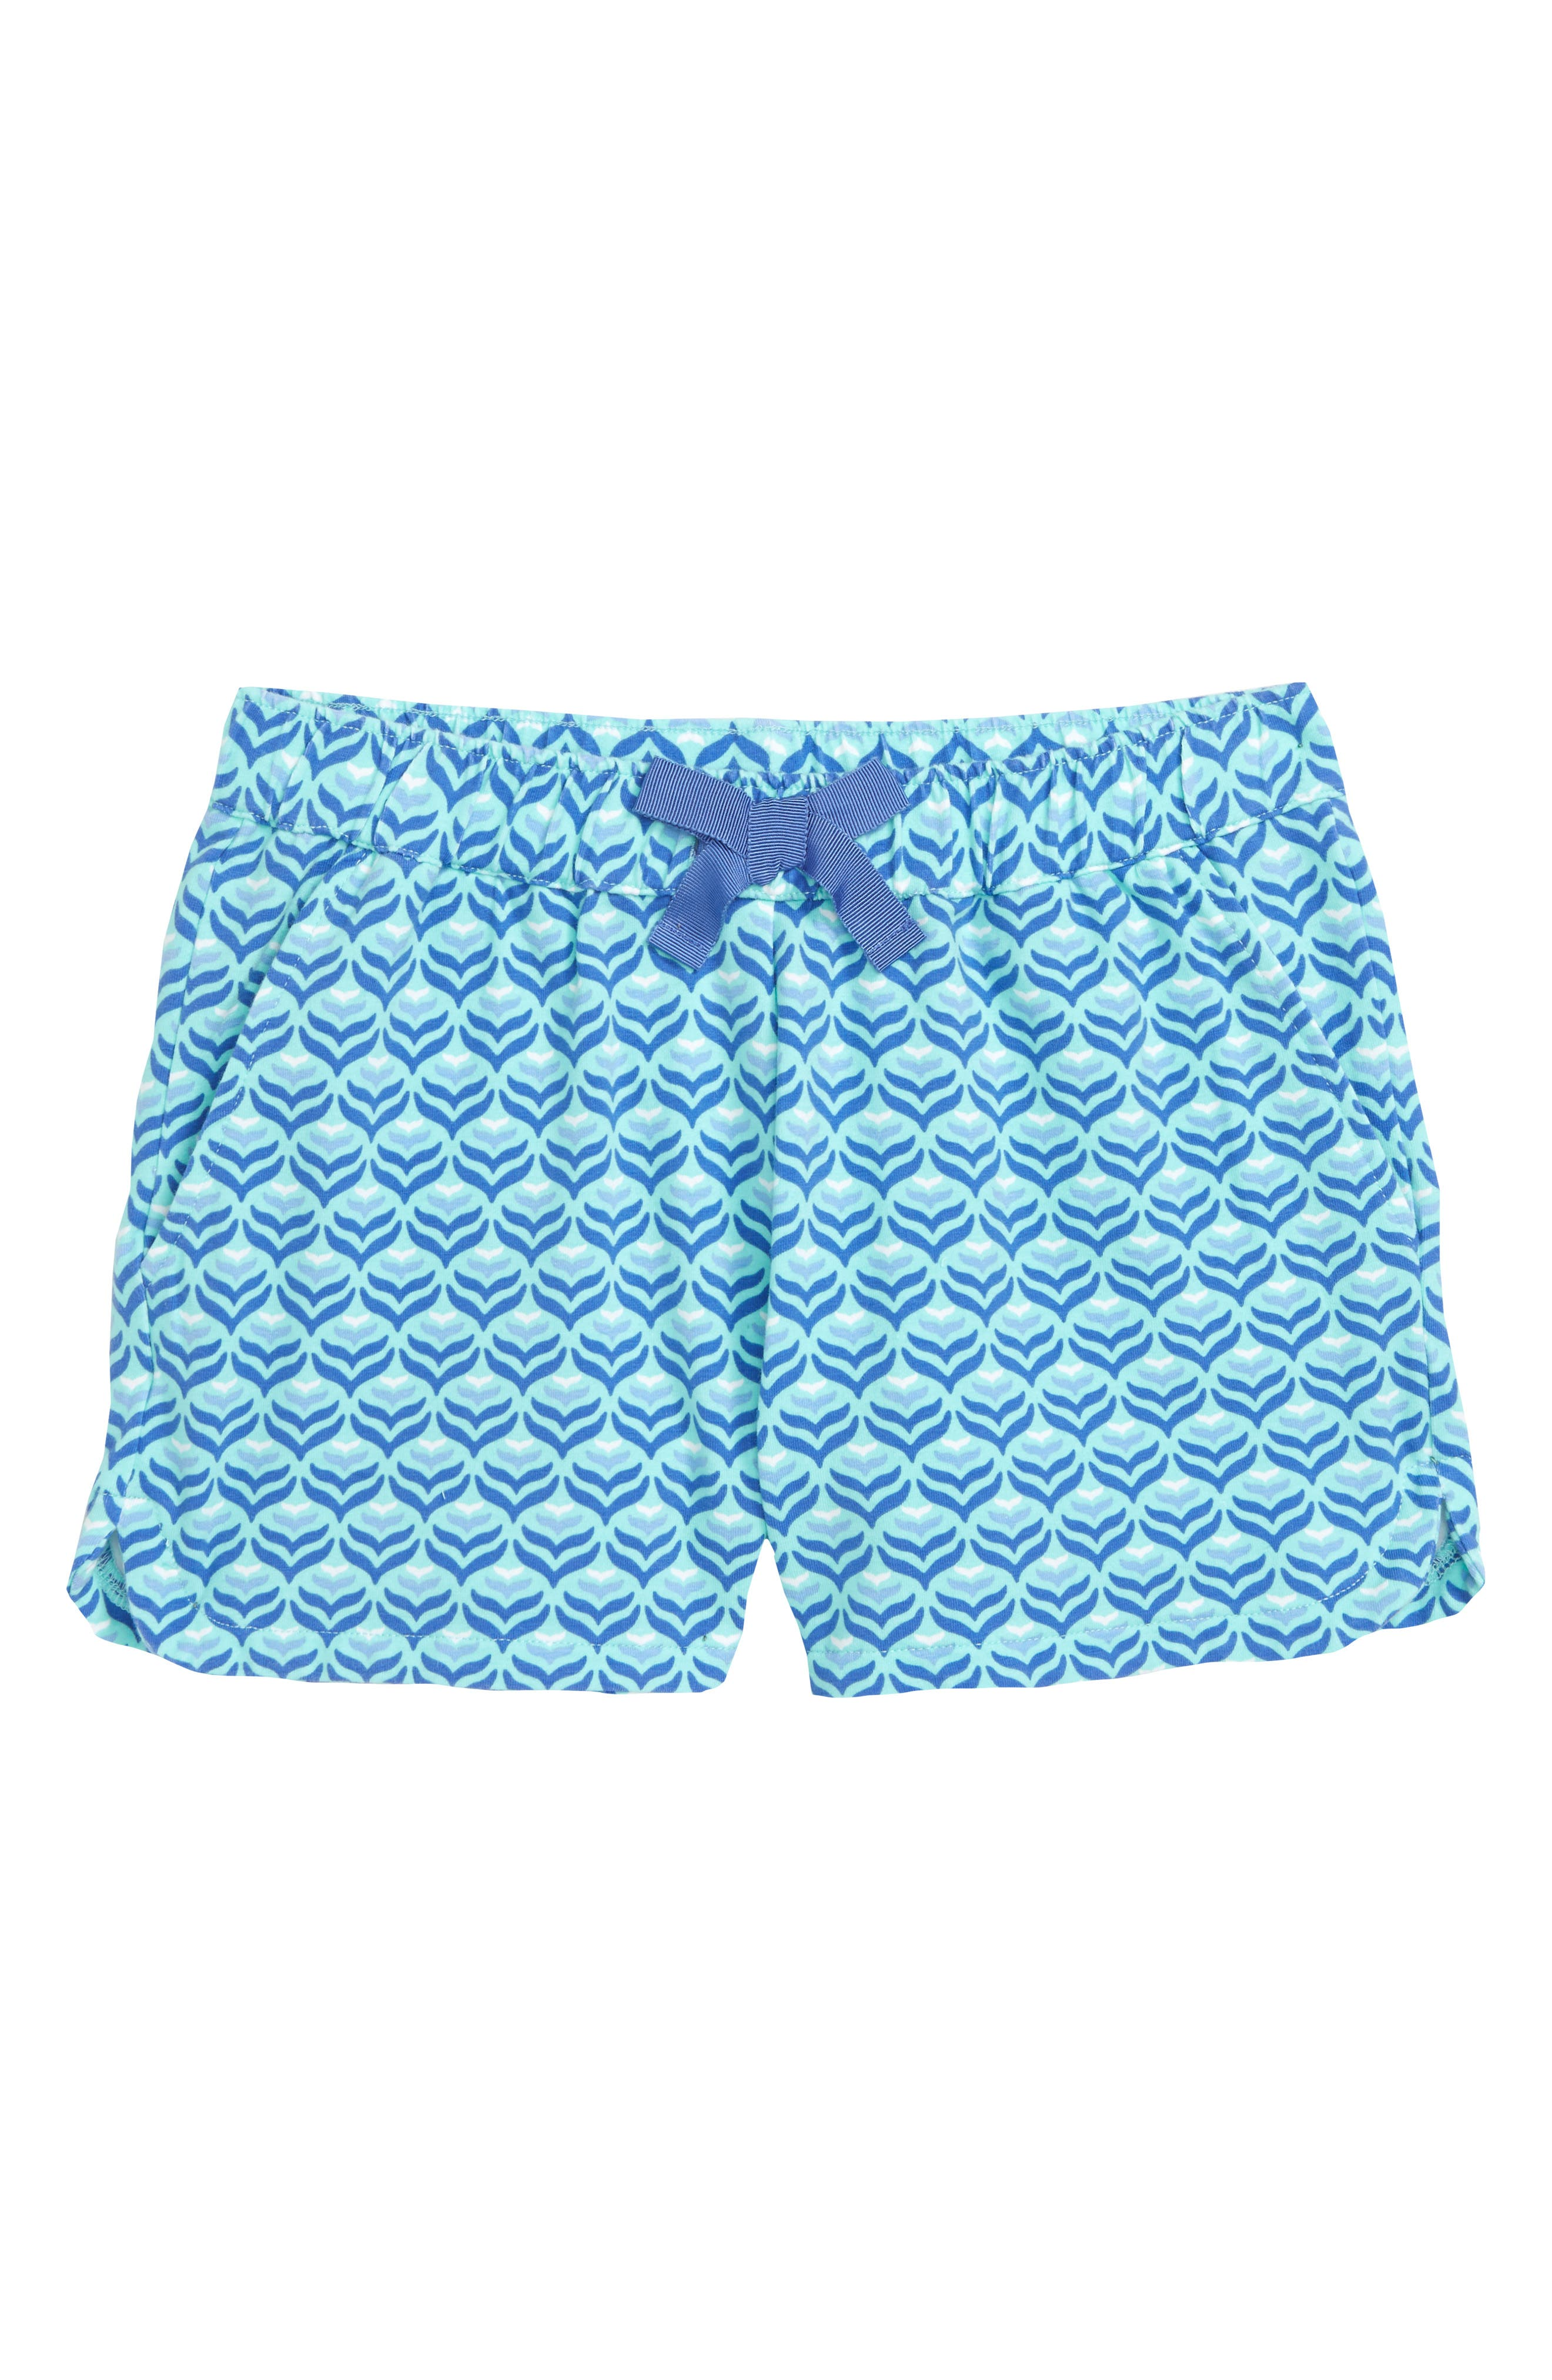 Diamond Whale Tail Shorts,                         Main,                         color, 416